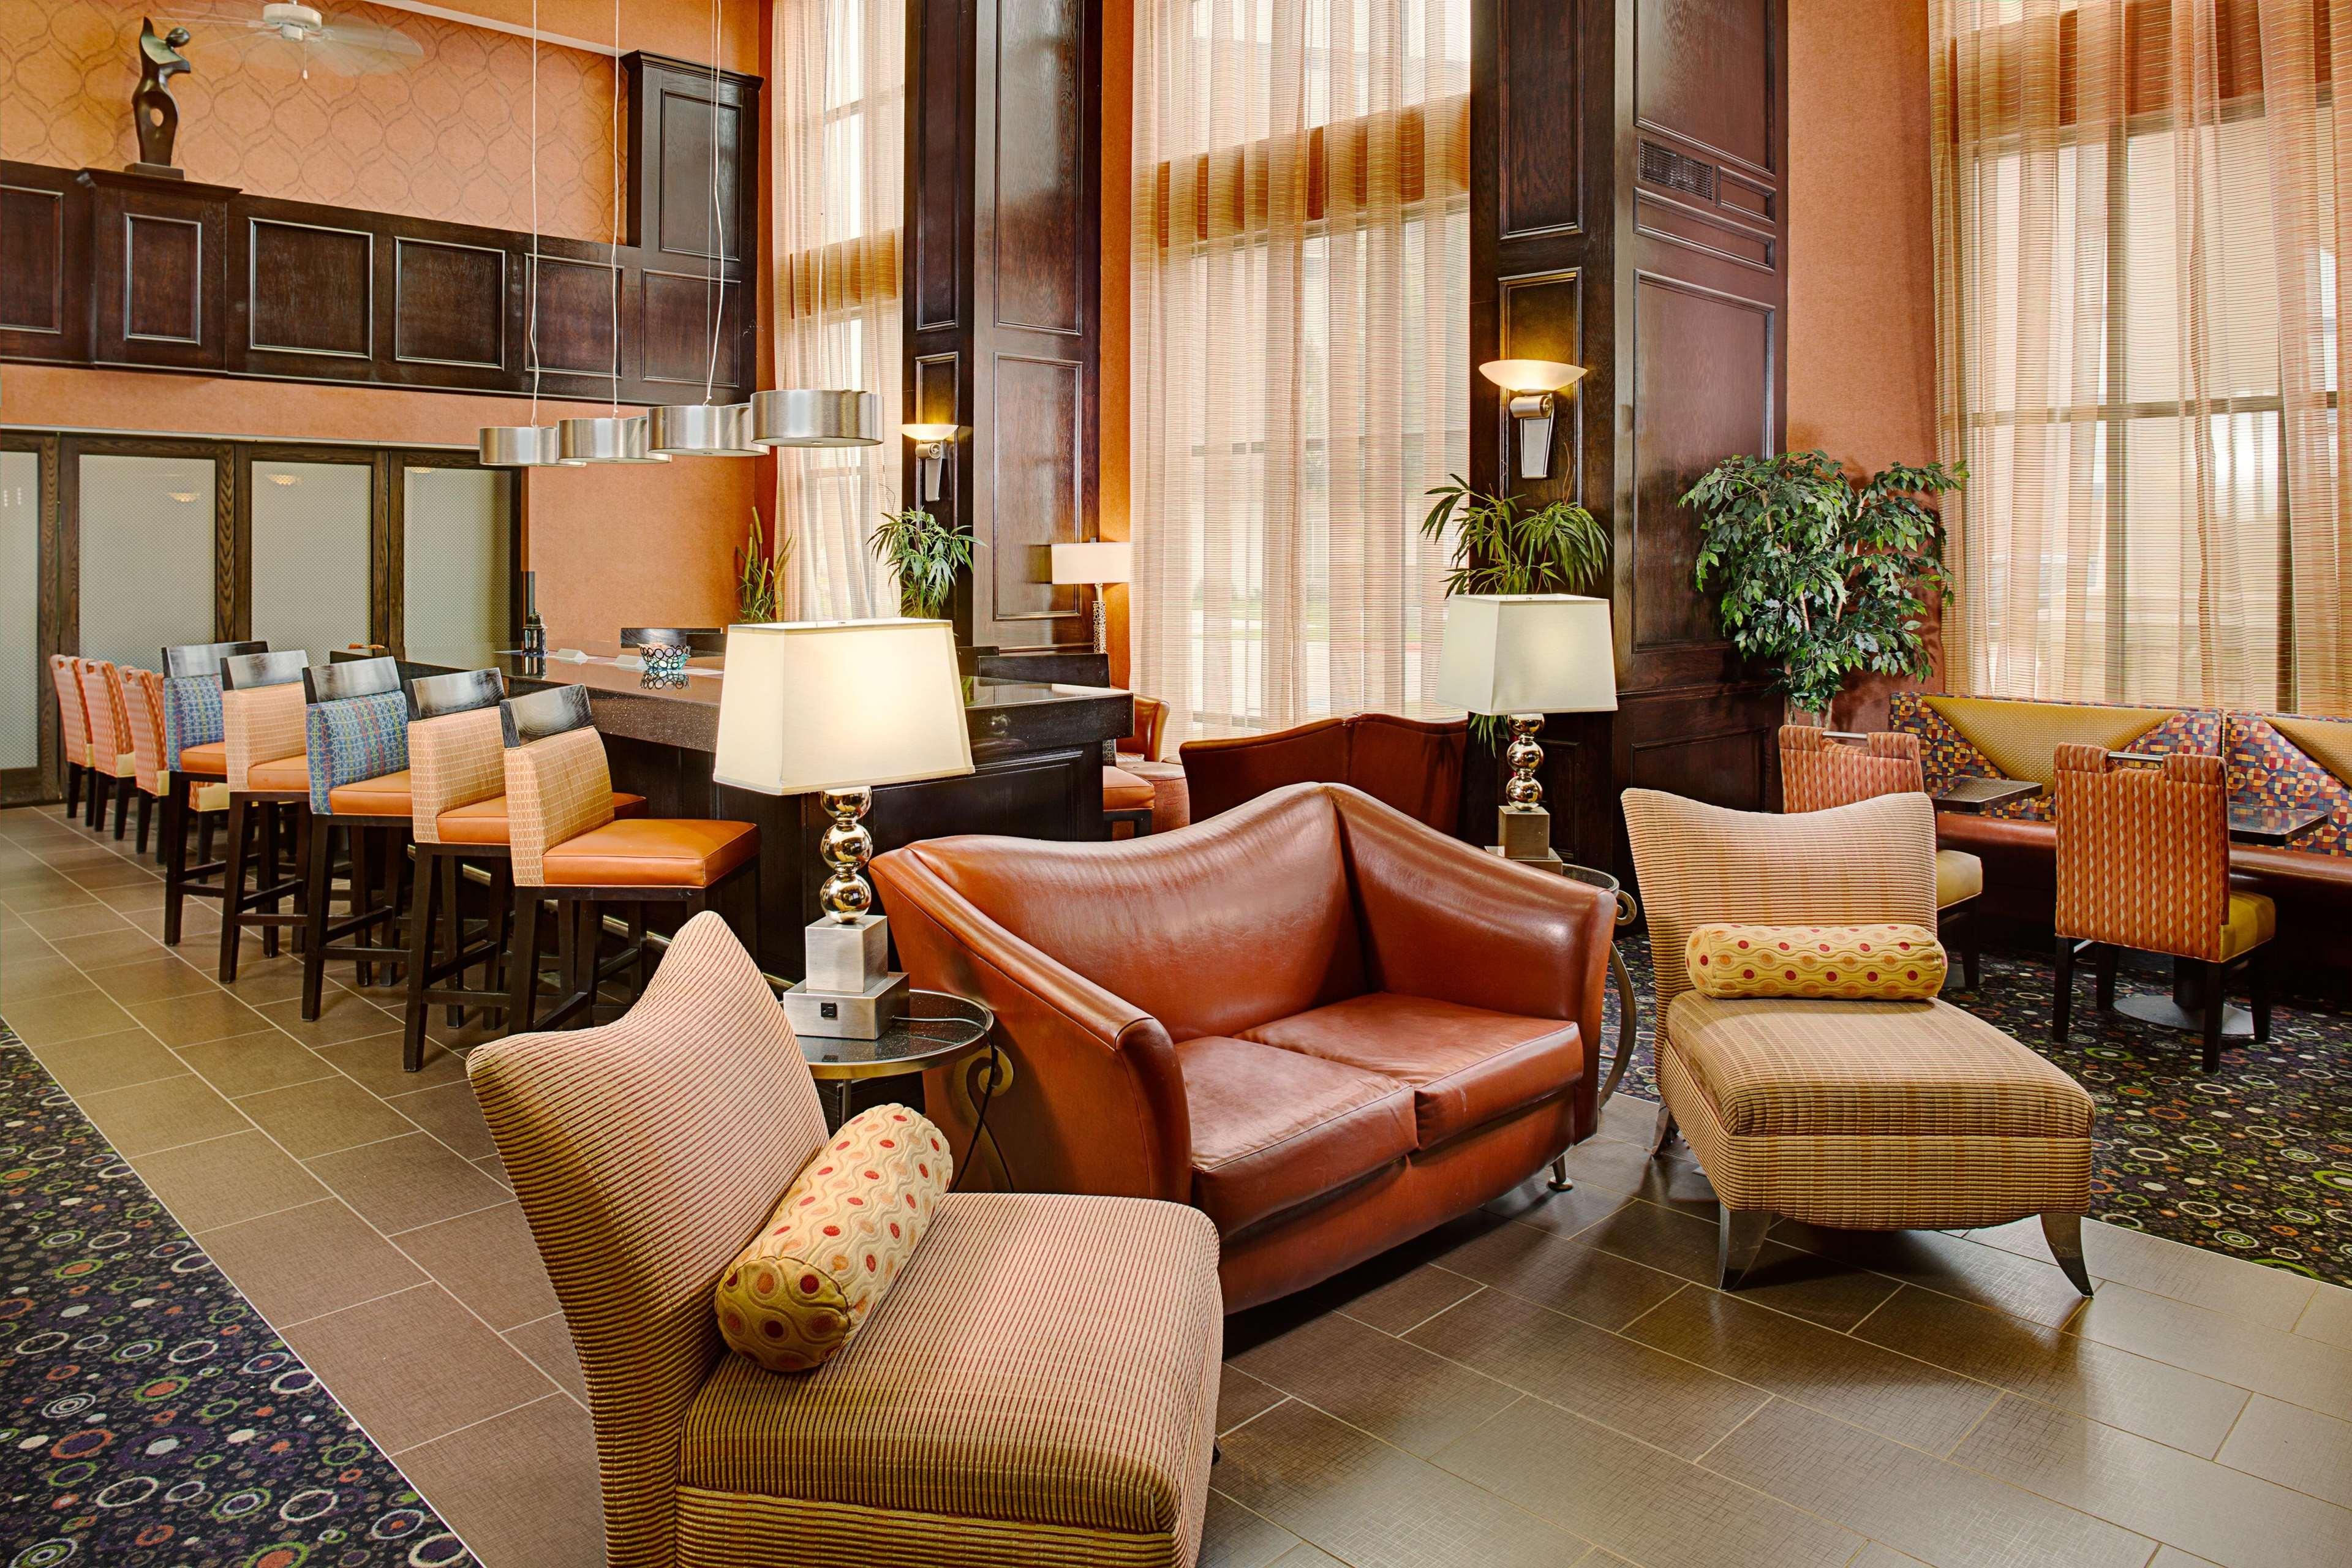 Hampton Inn & Suites Dallas/Lewisville-Vista Ridge Mall, TX image 38